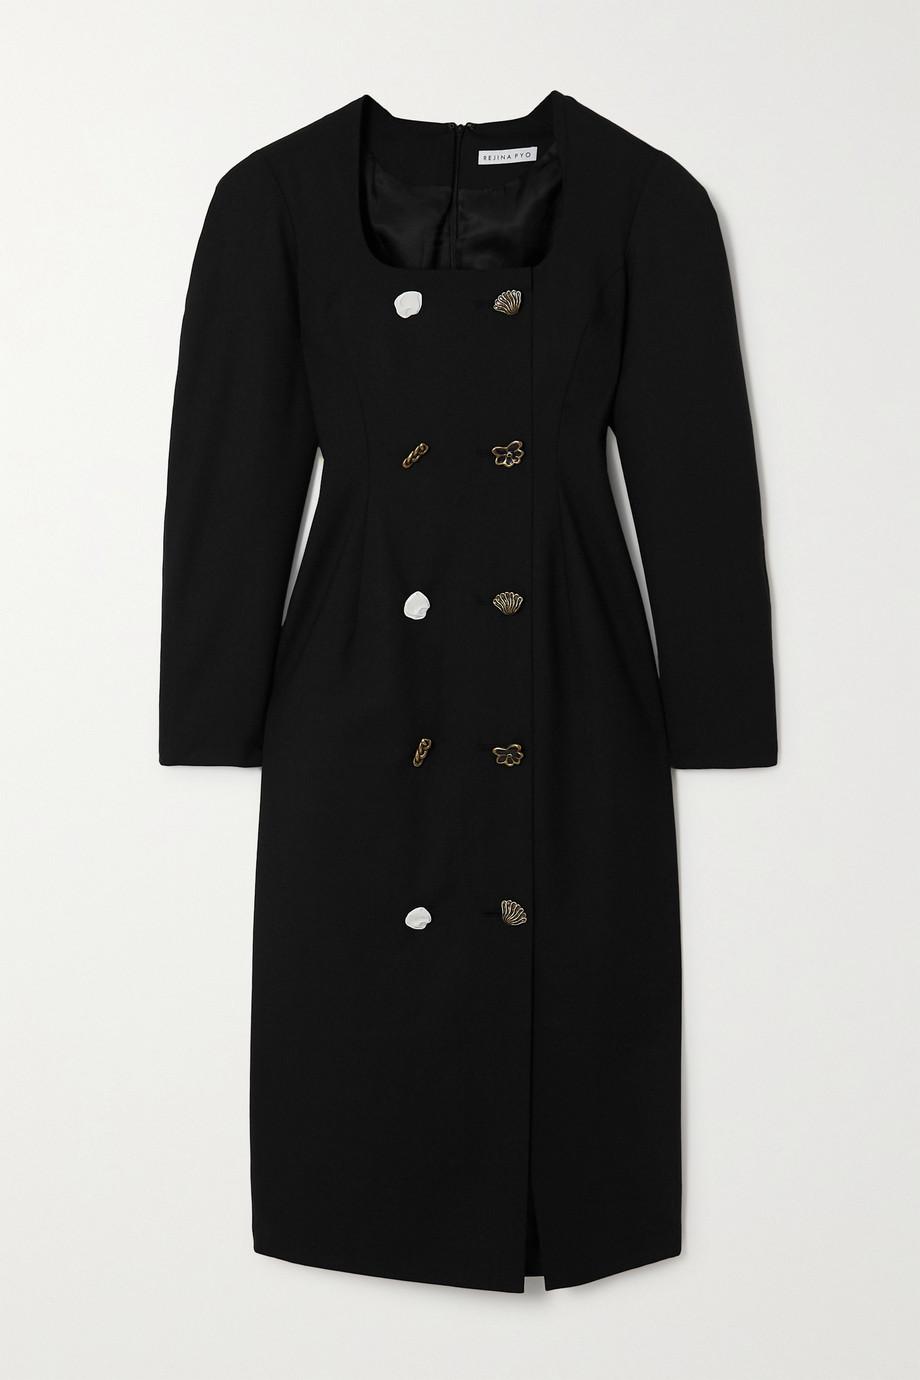 REJINA PYO Camila button-embellished wool-blend midi dress